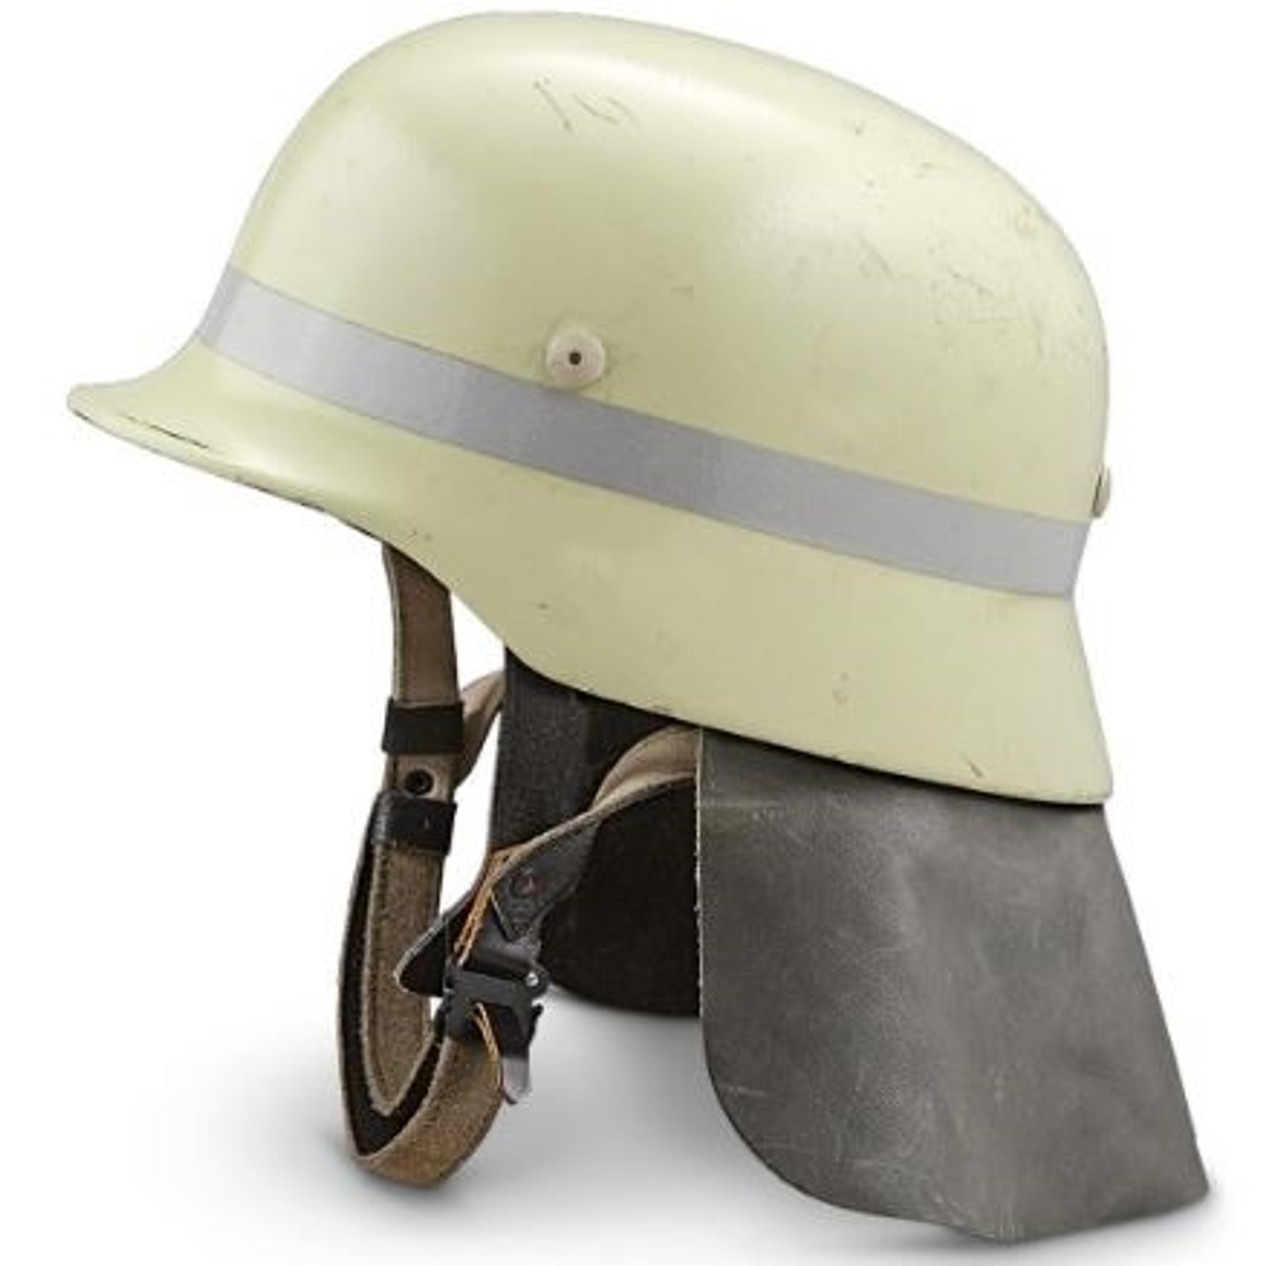 Bundeswehr M35 Style Fireman's Helmet from Hessen Antique